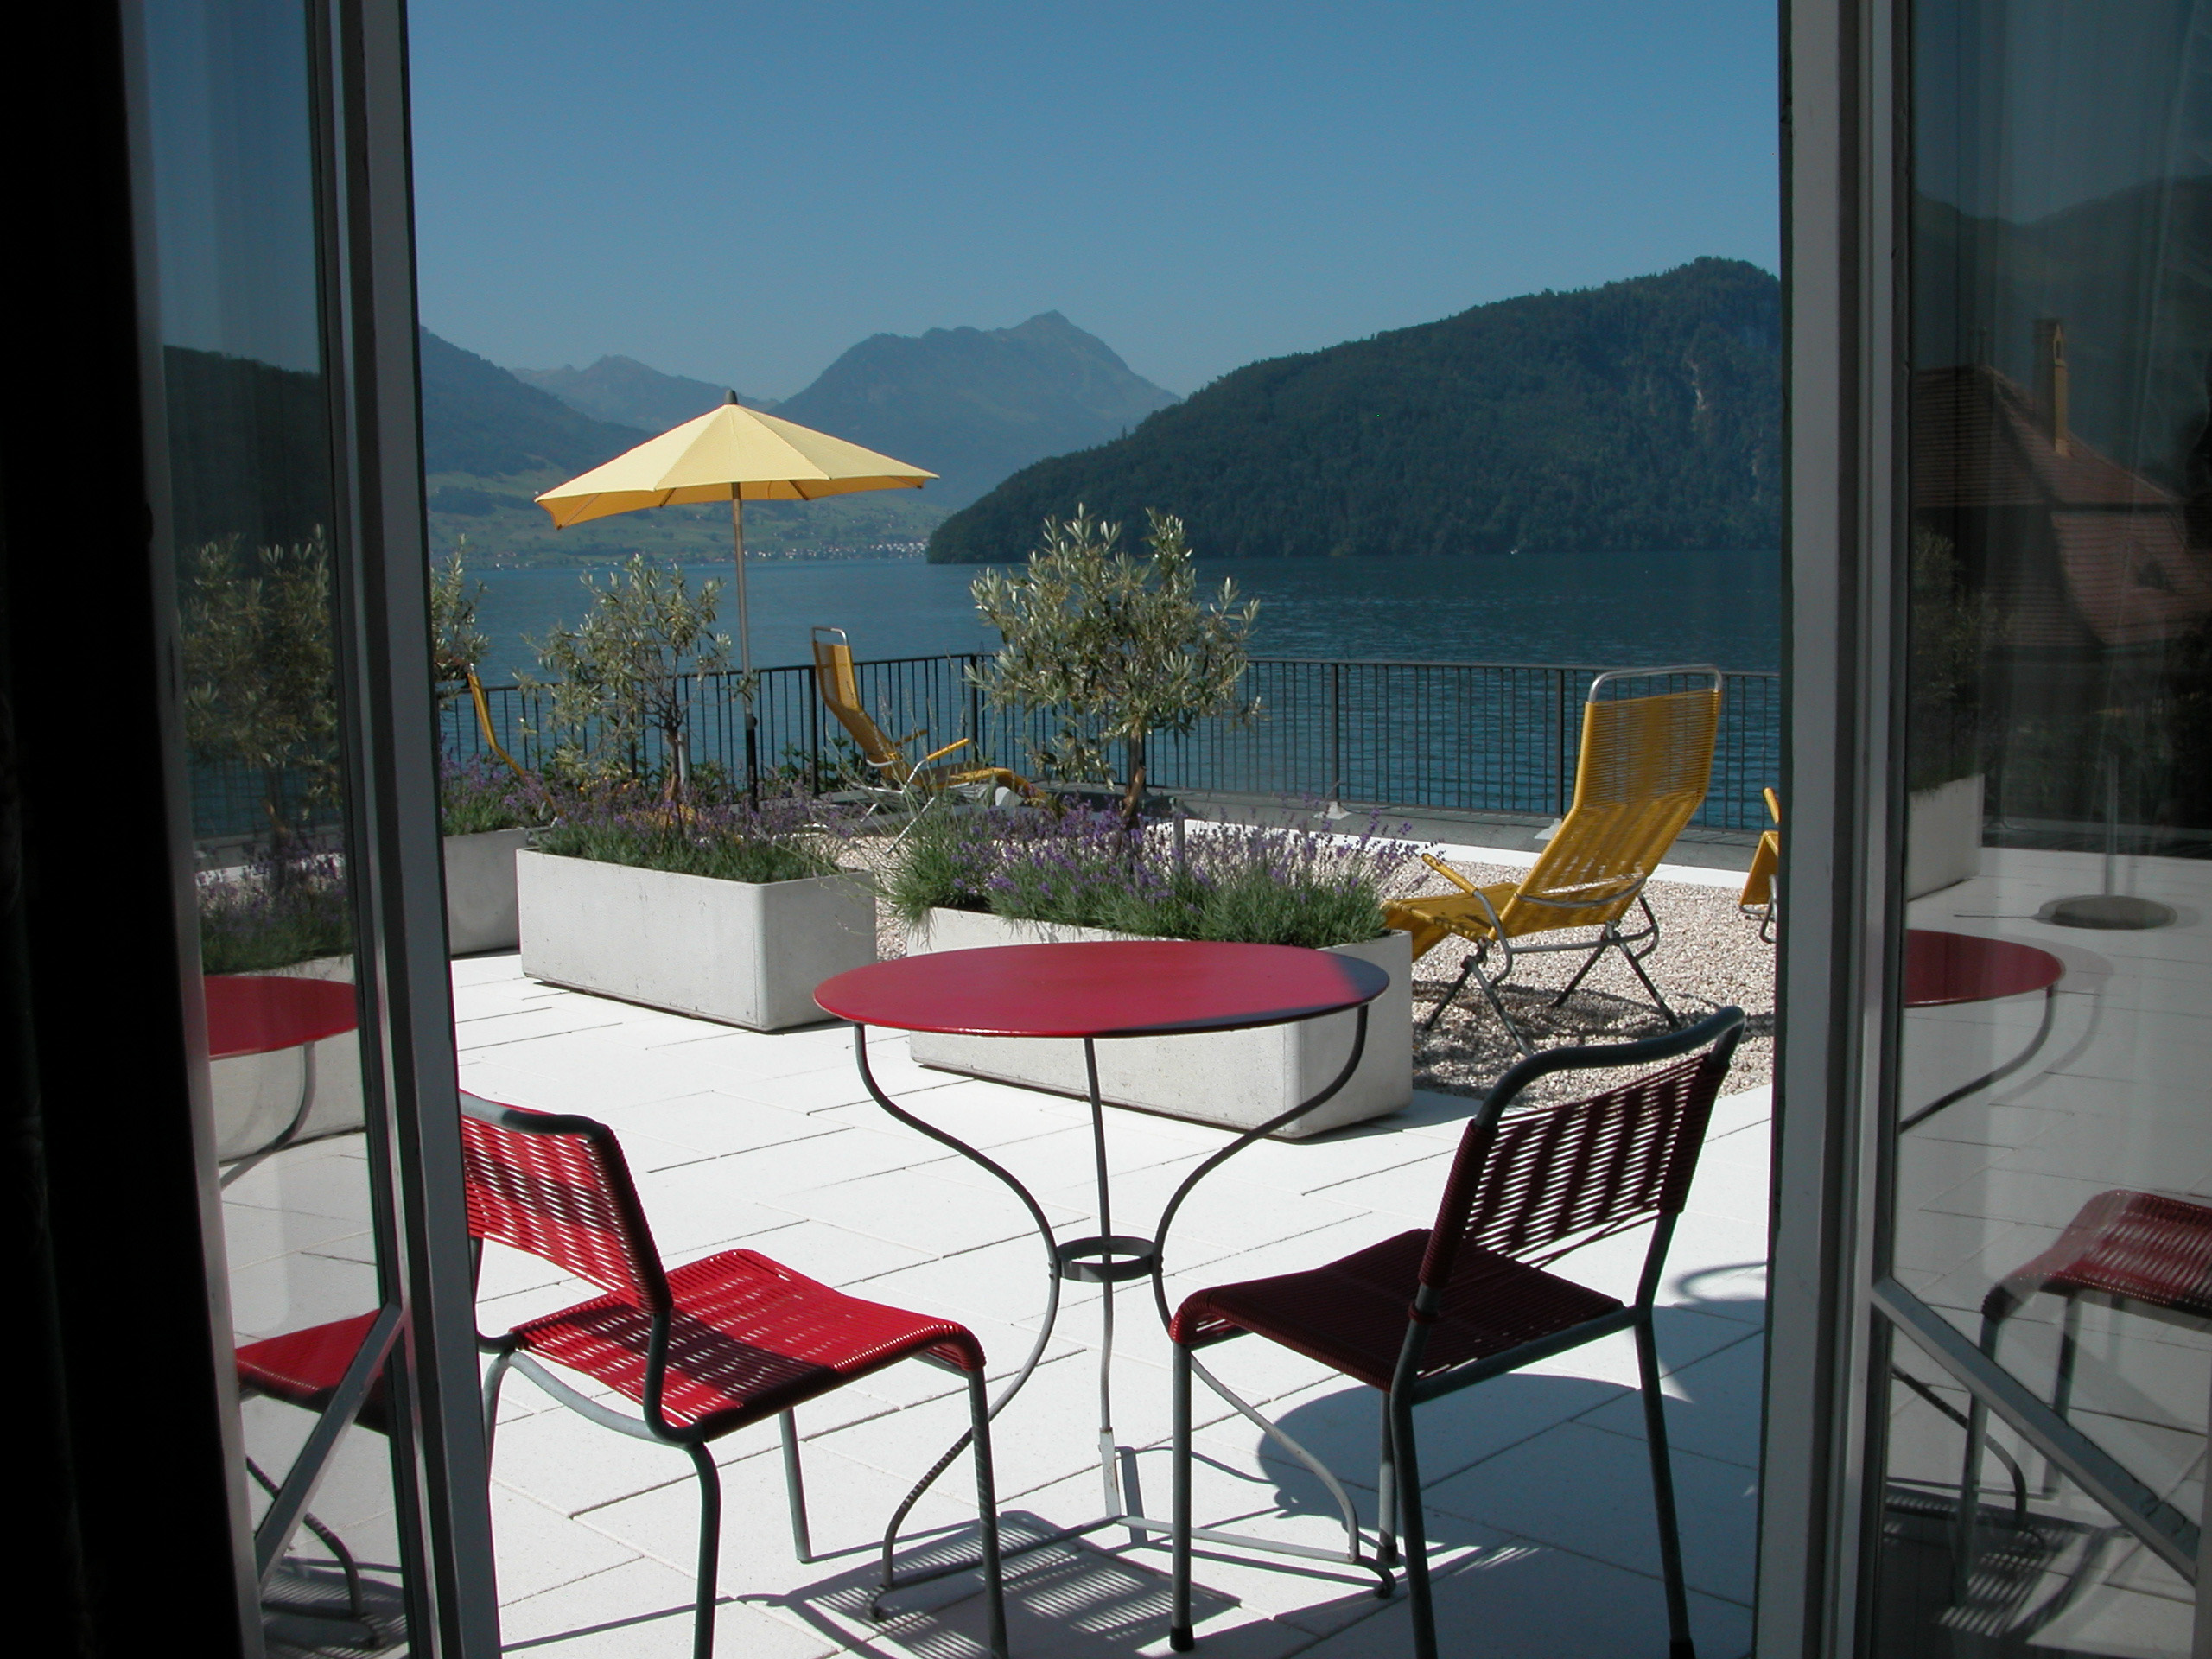 superiorzimmer balkon 105 hotel terrasse am see. Black Bedroom Furniture Sets. Home Design Ideas